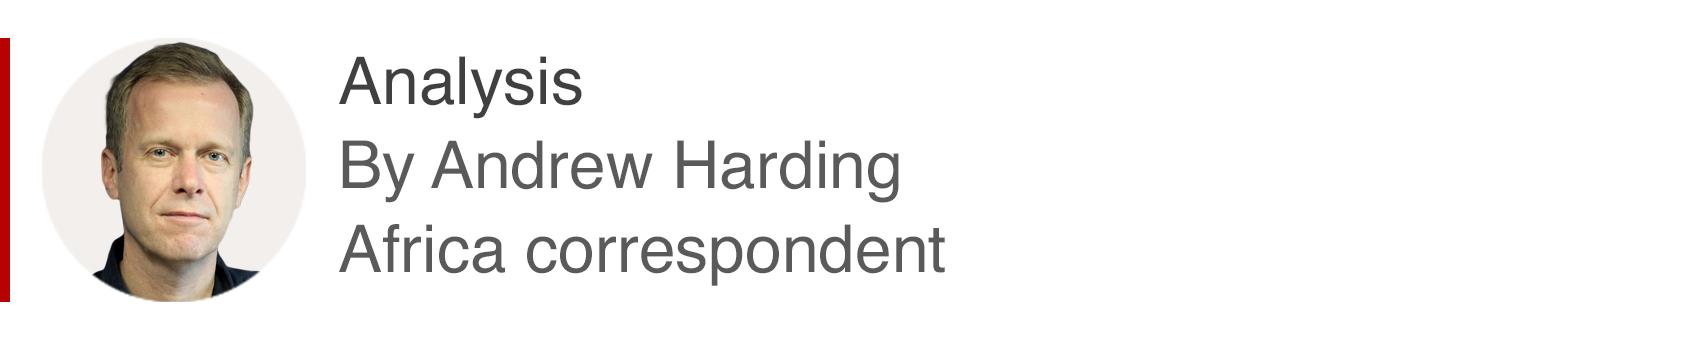 Analysis box by Andrew Harding, Africa correspondent